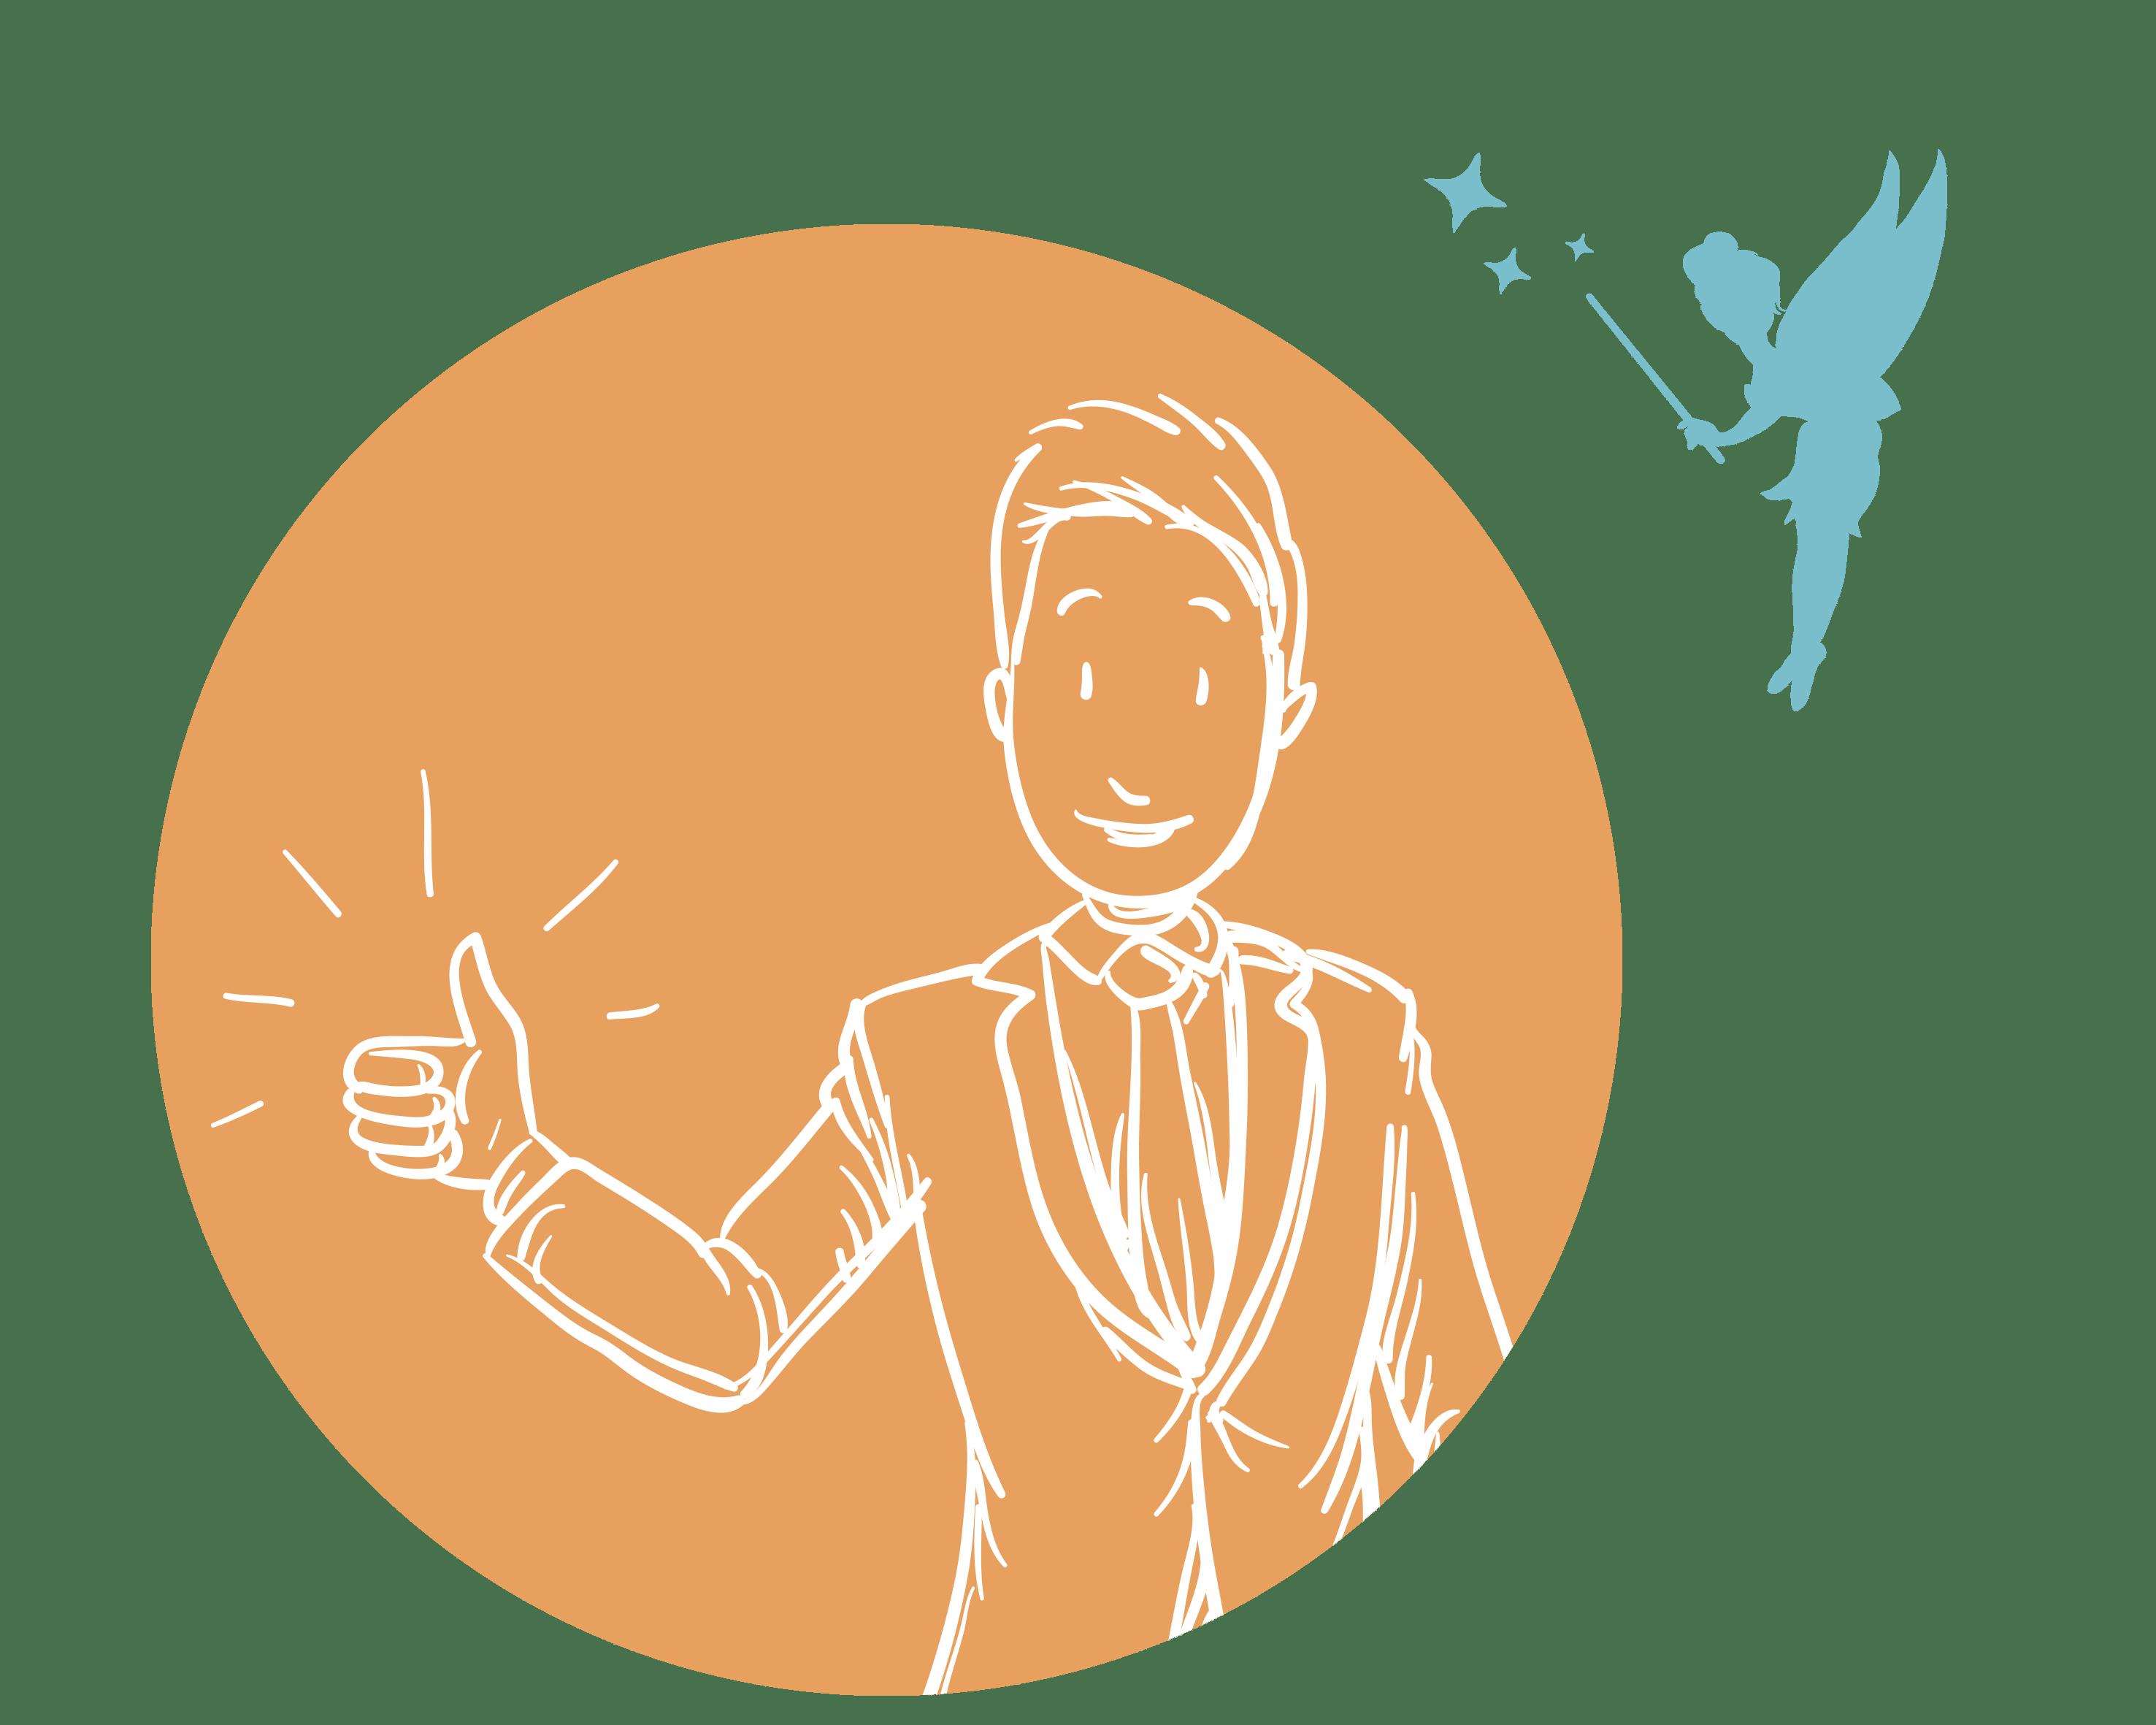 Illustration positive Coach mit Careoline